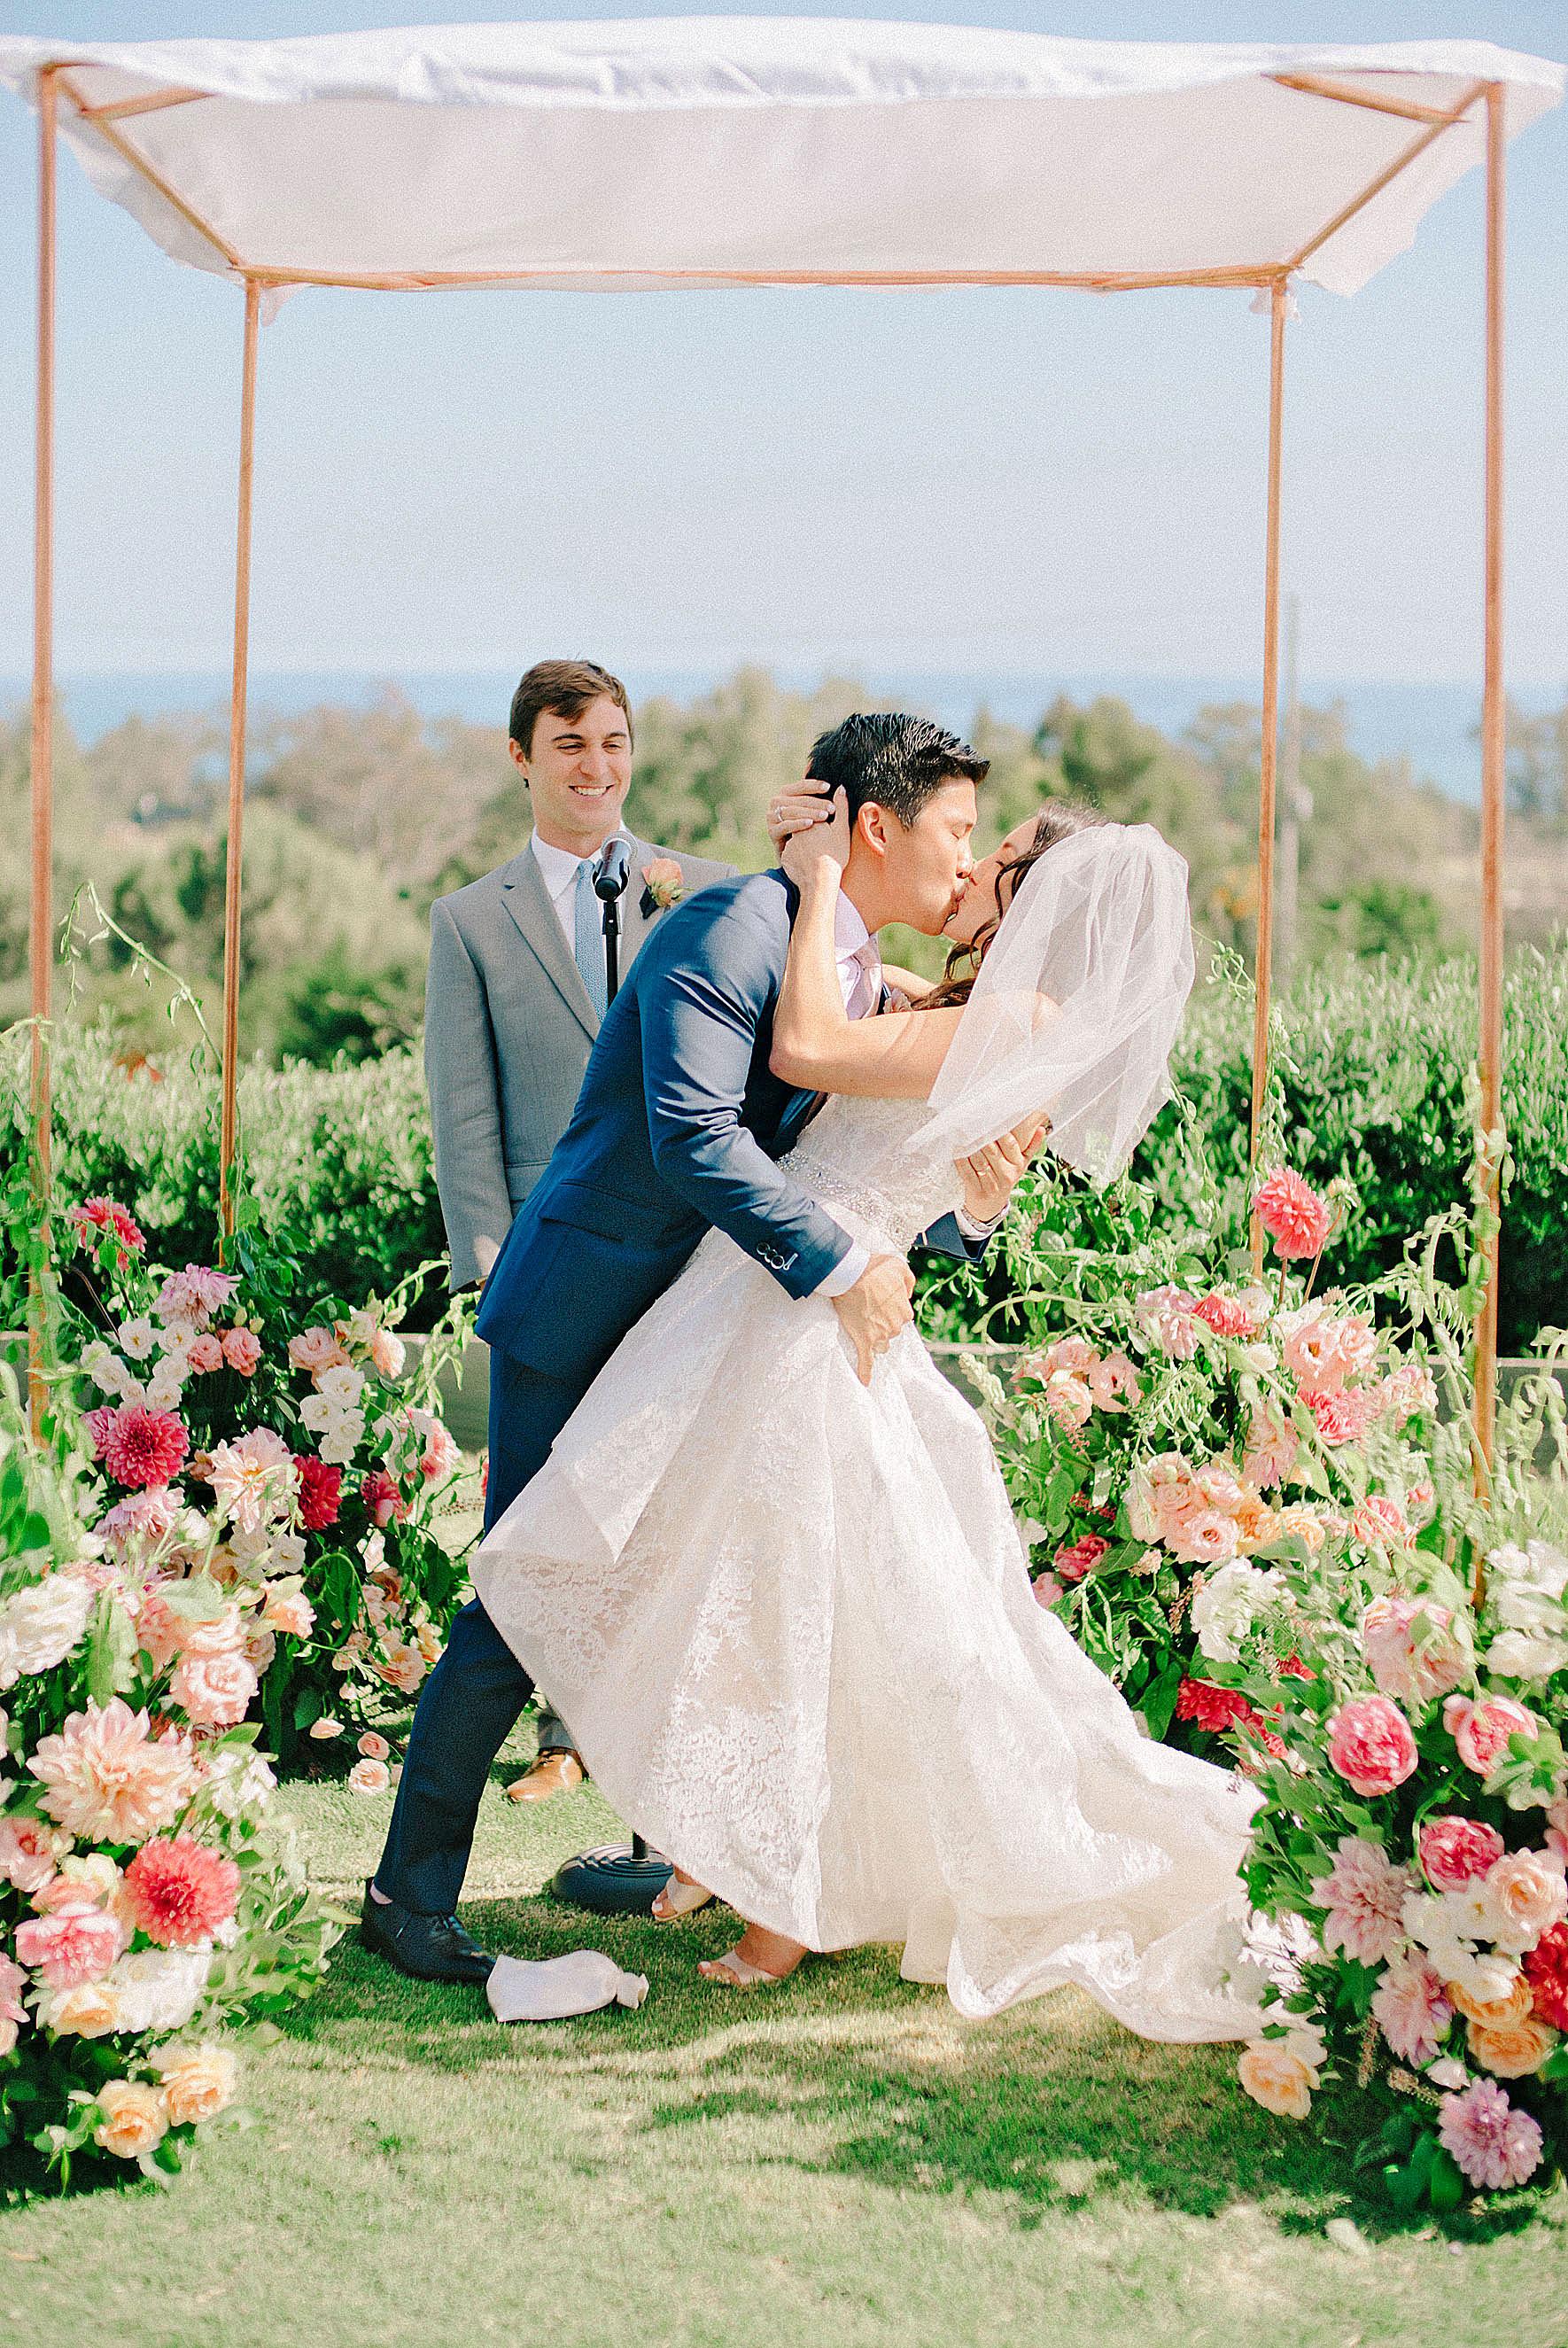 perri phillip wedding california ceremony kiss